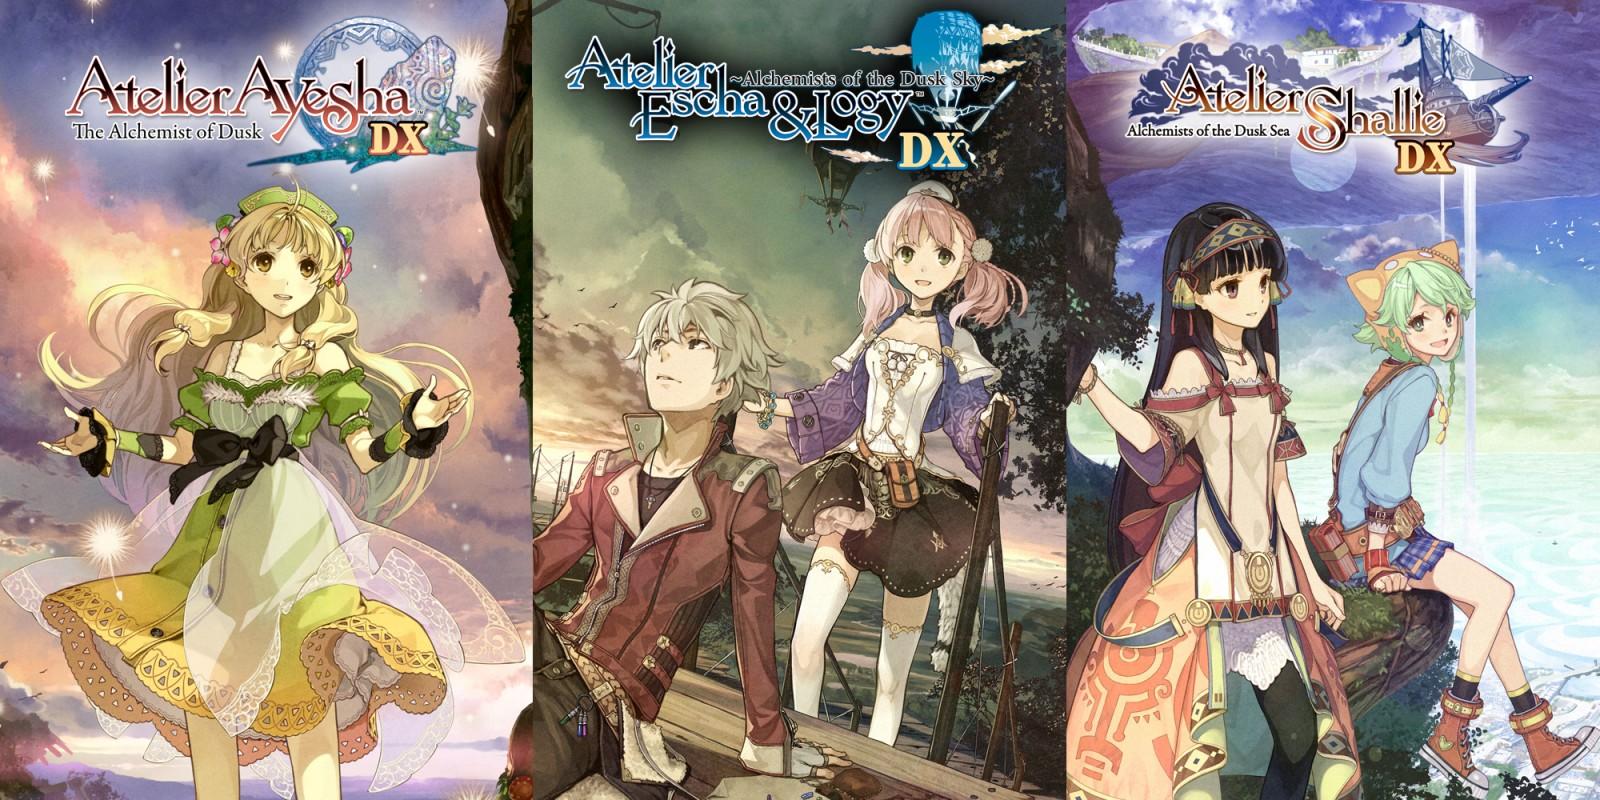 Atelier Dusk Trilogy Deluxe Pack sur jdrpg.fr